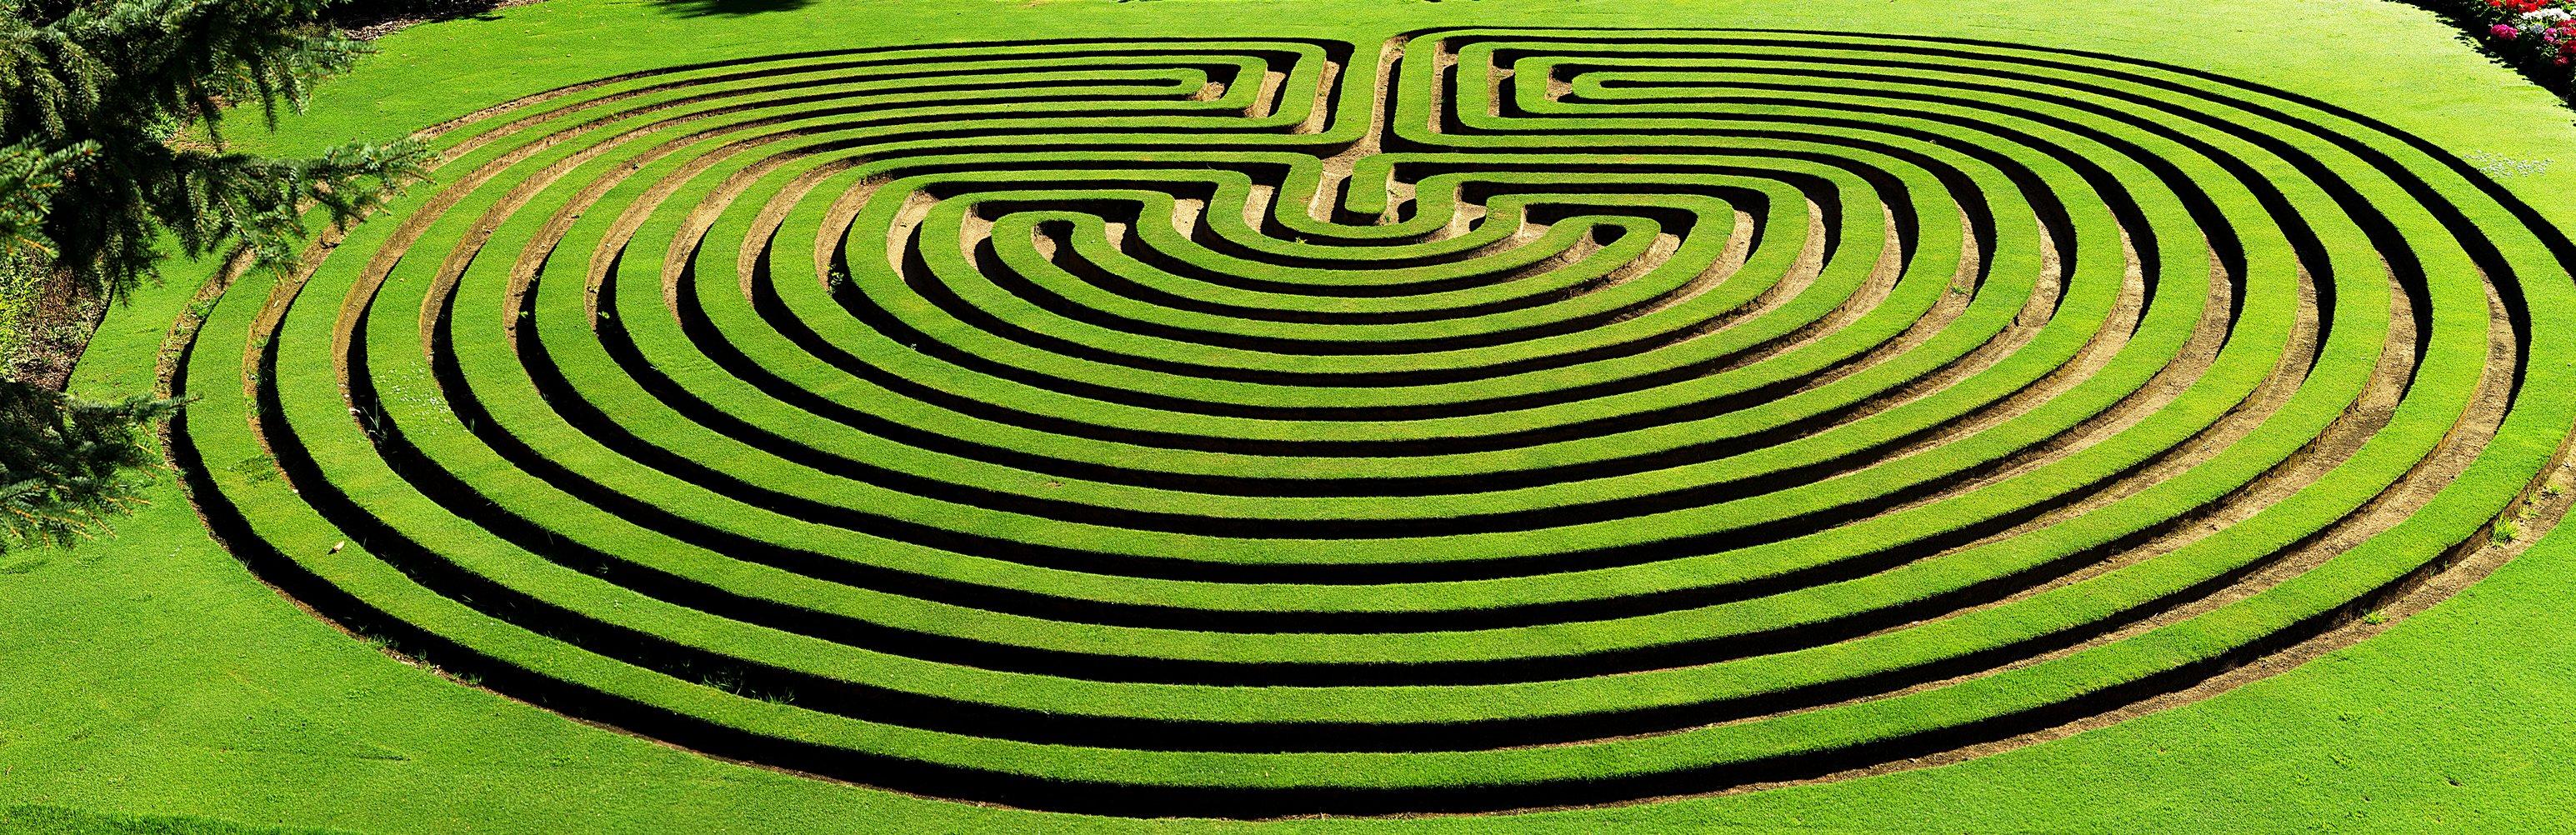 1_maze_resized.jpg